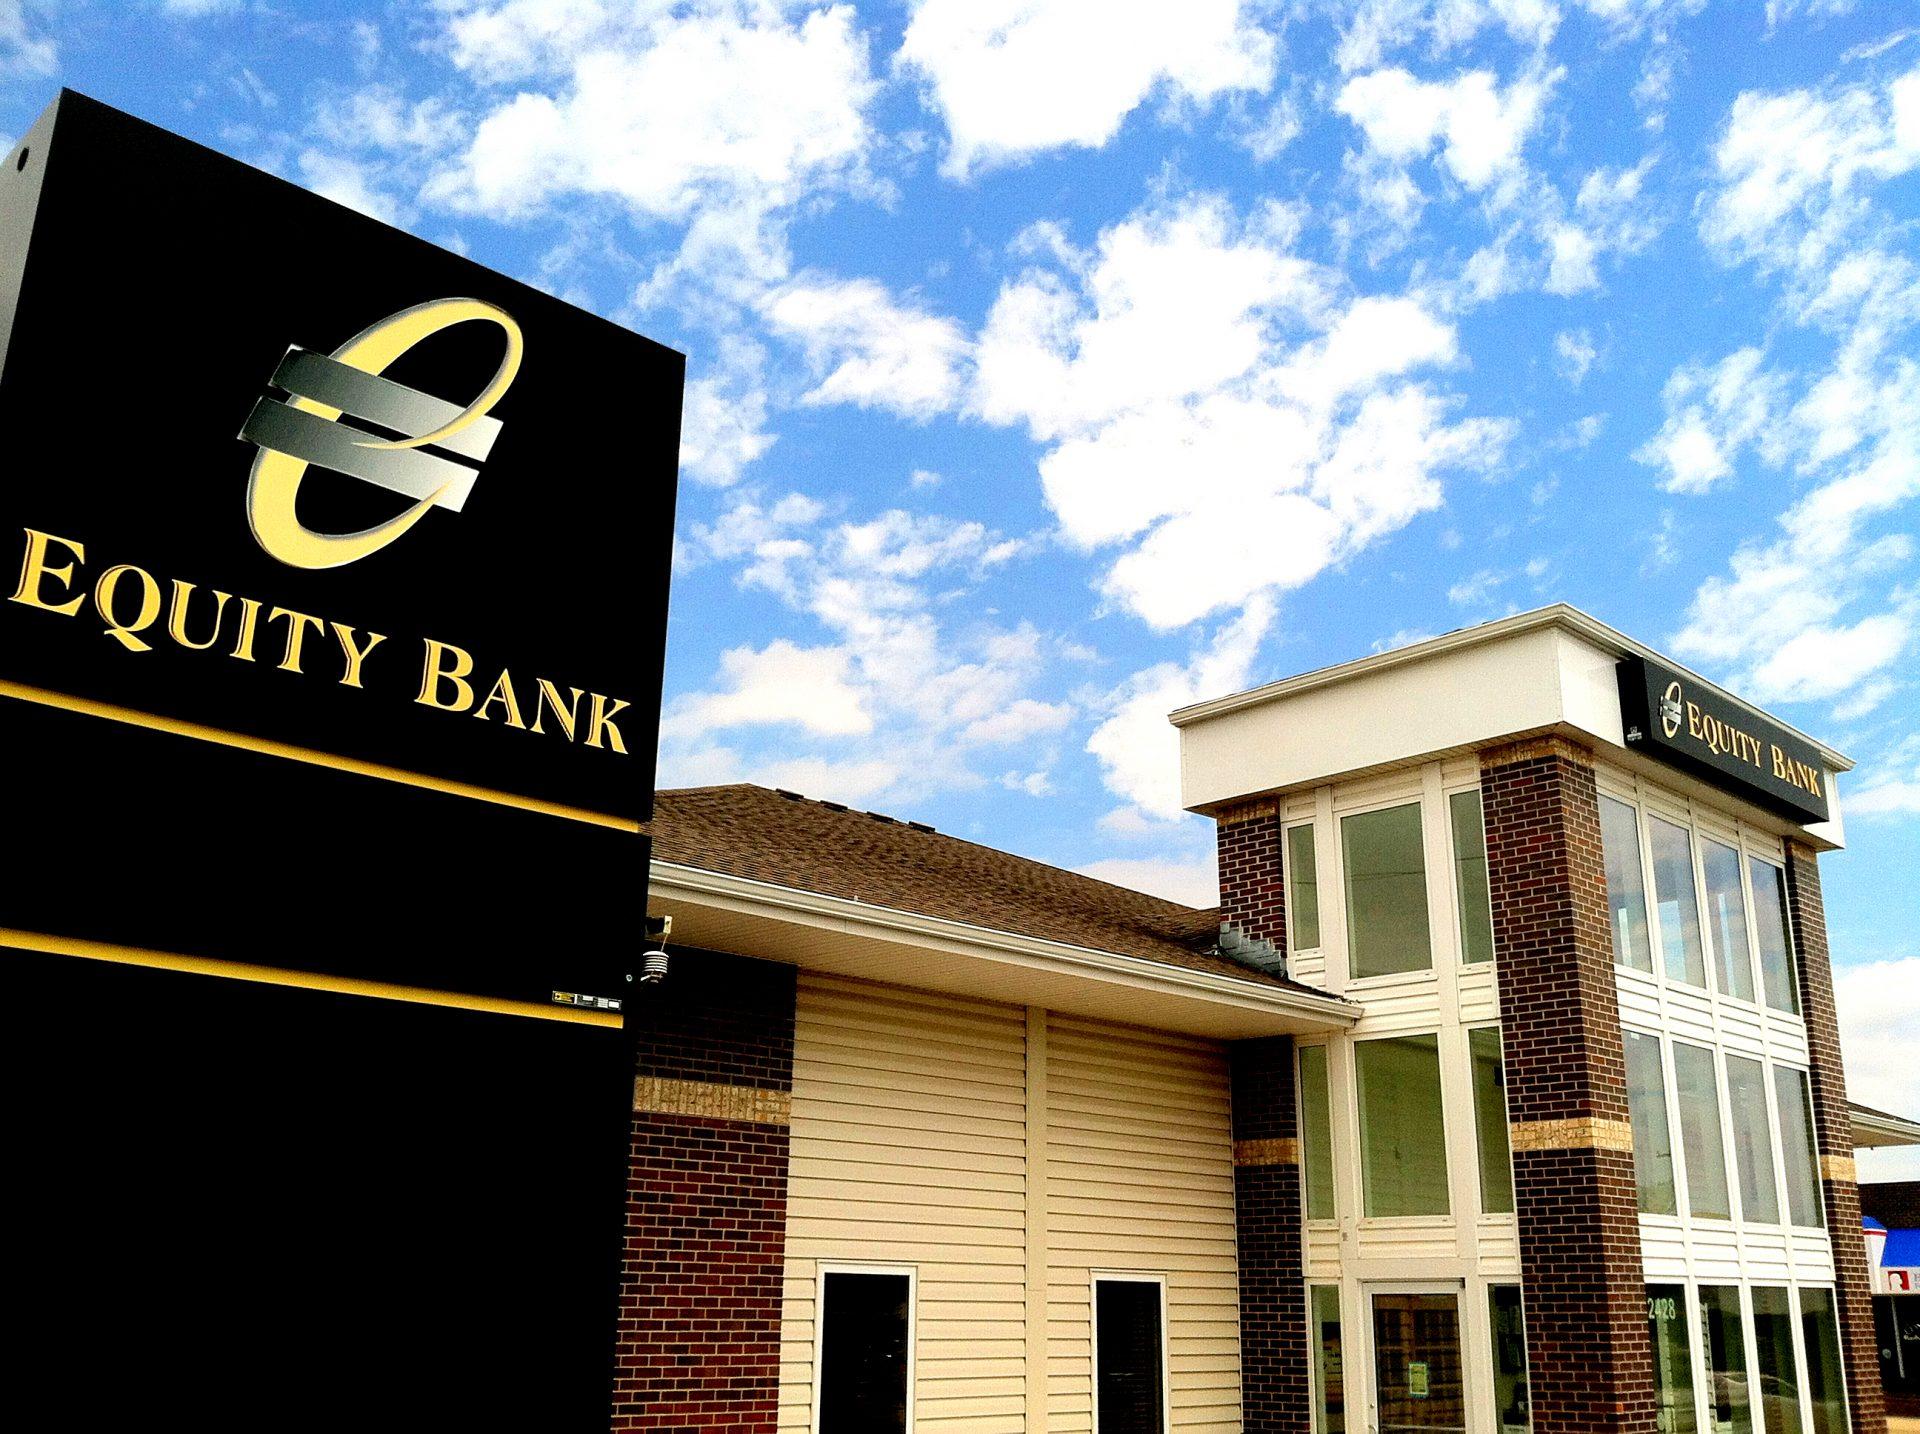 Equity Bank Hays branch exterior.